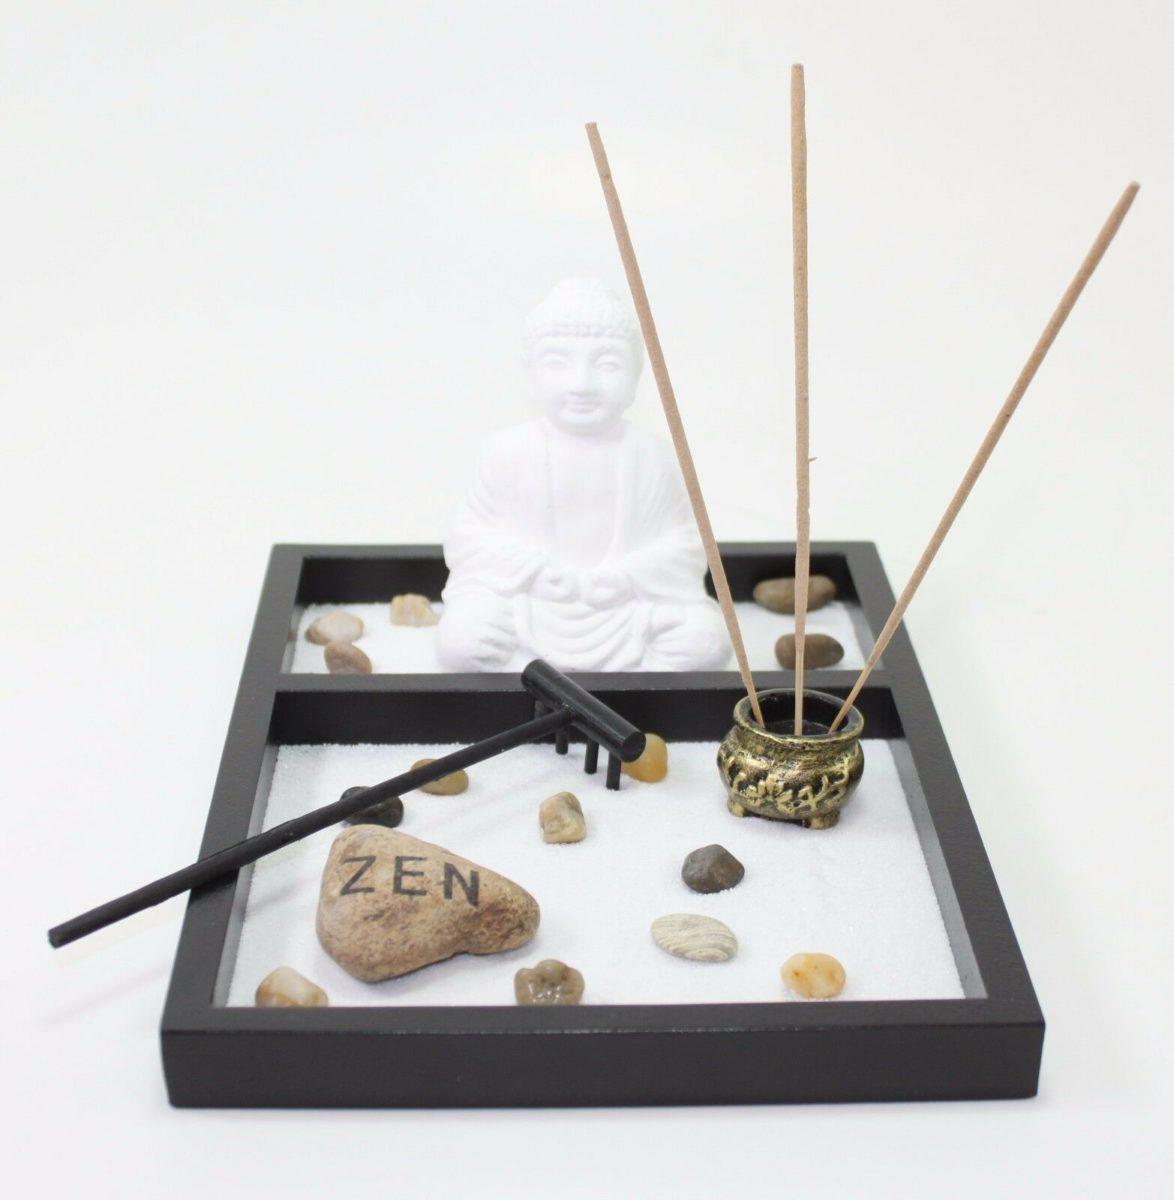 giardino-zen-fai-da-te-buddha